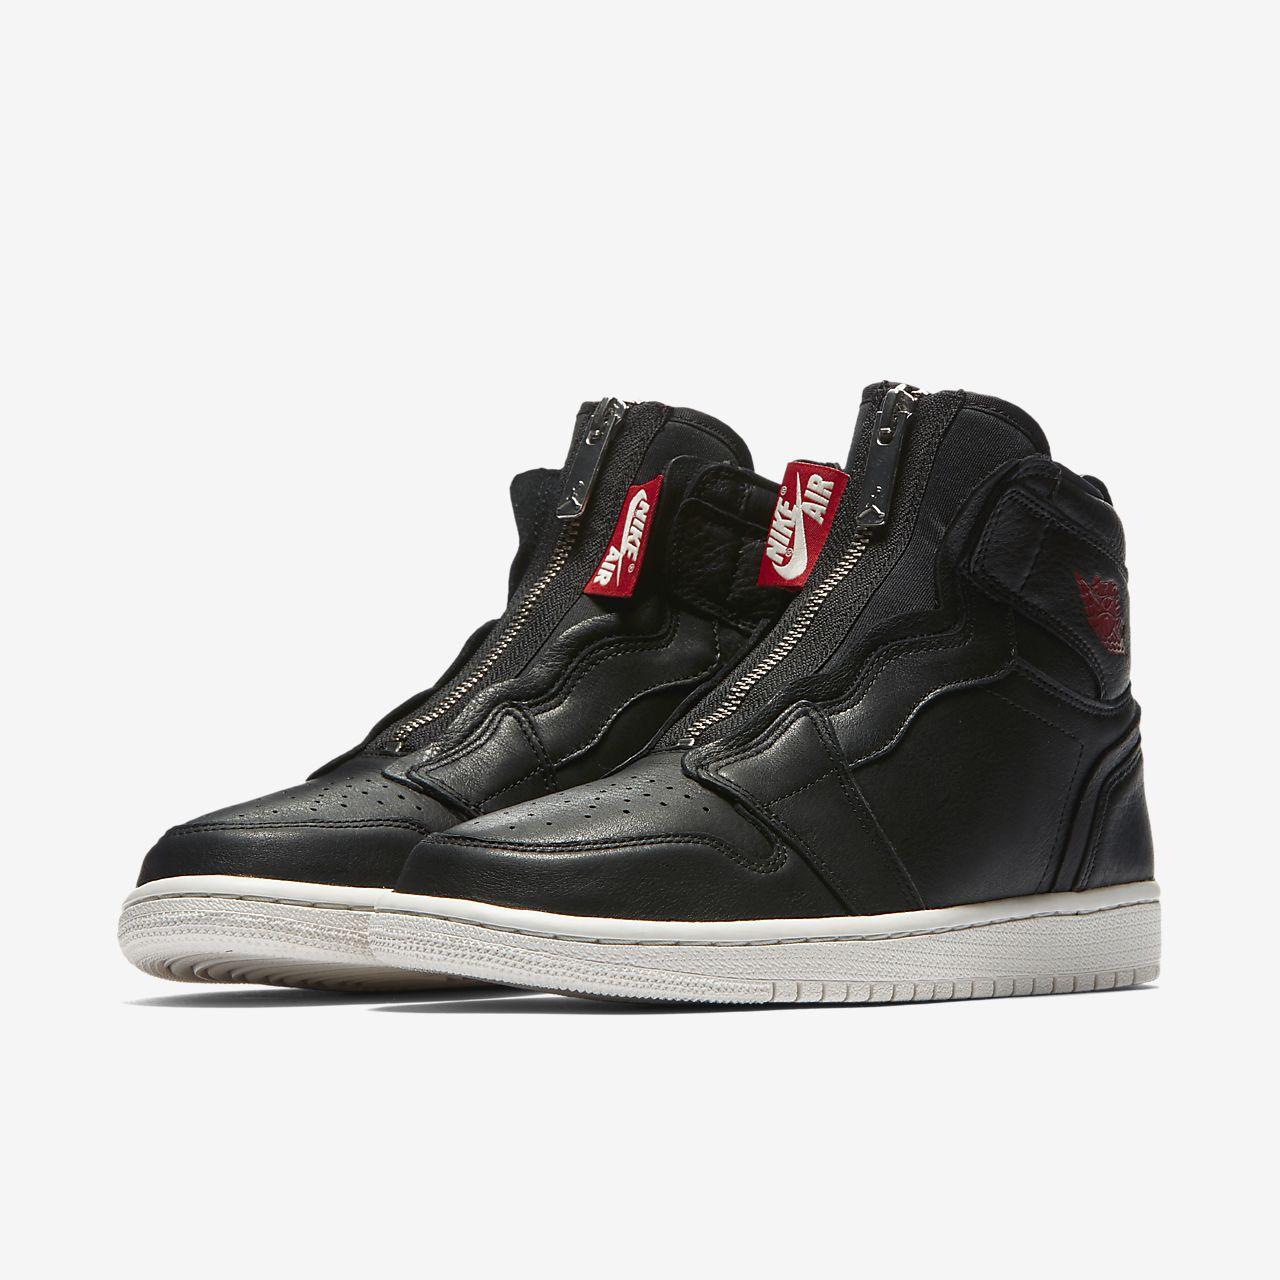 promo code 183e9 2db58 ... Air Jordan 1 High Zip Premium Women s Shoe